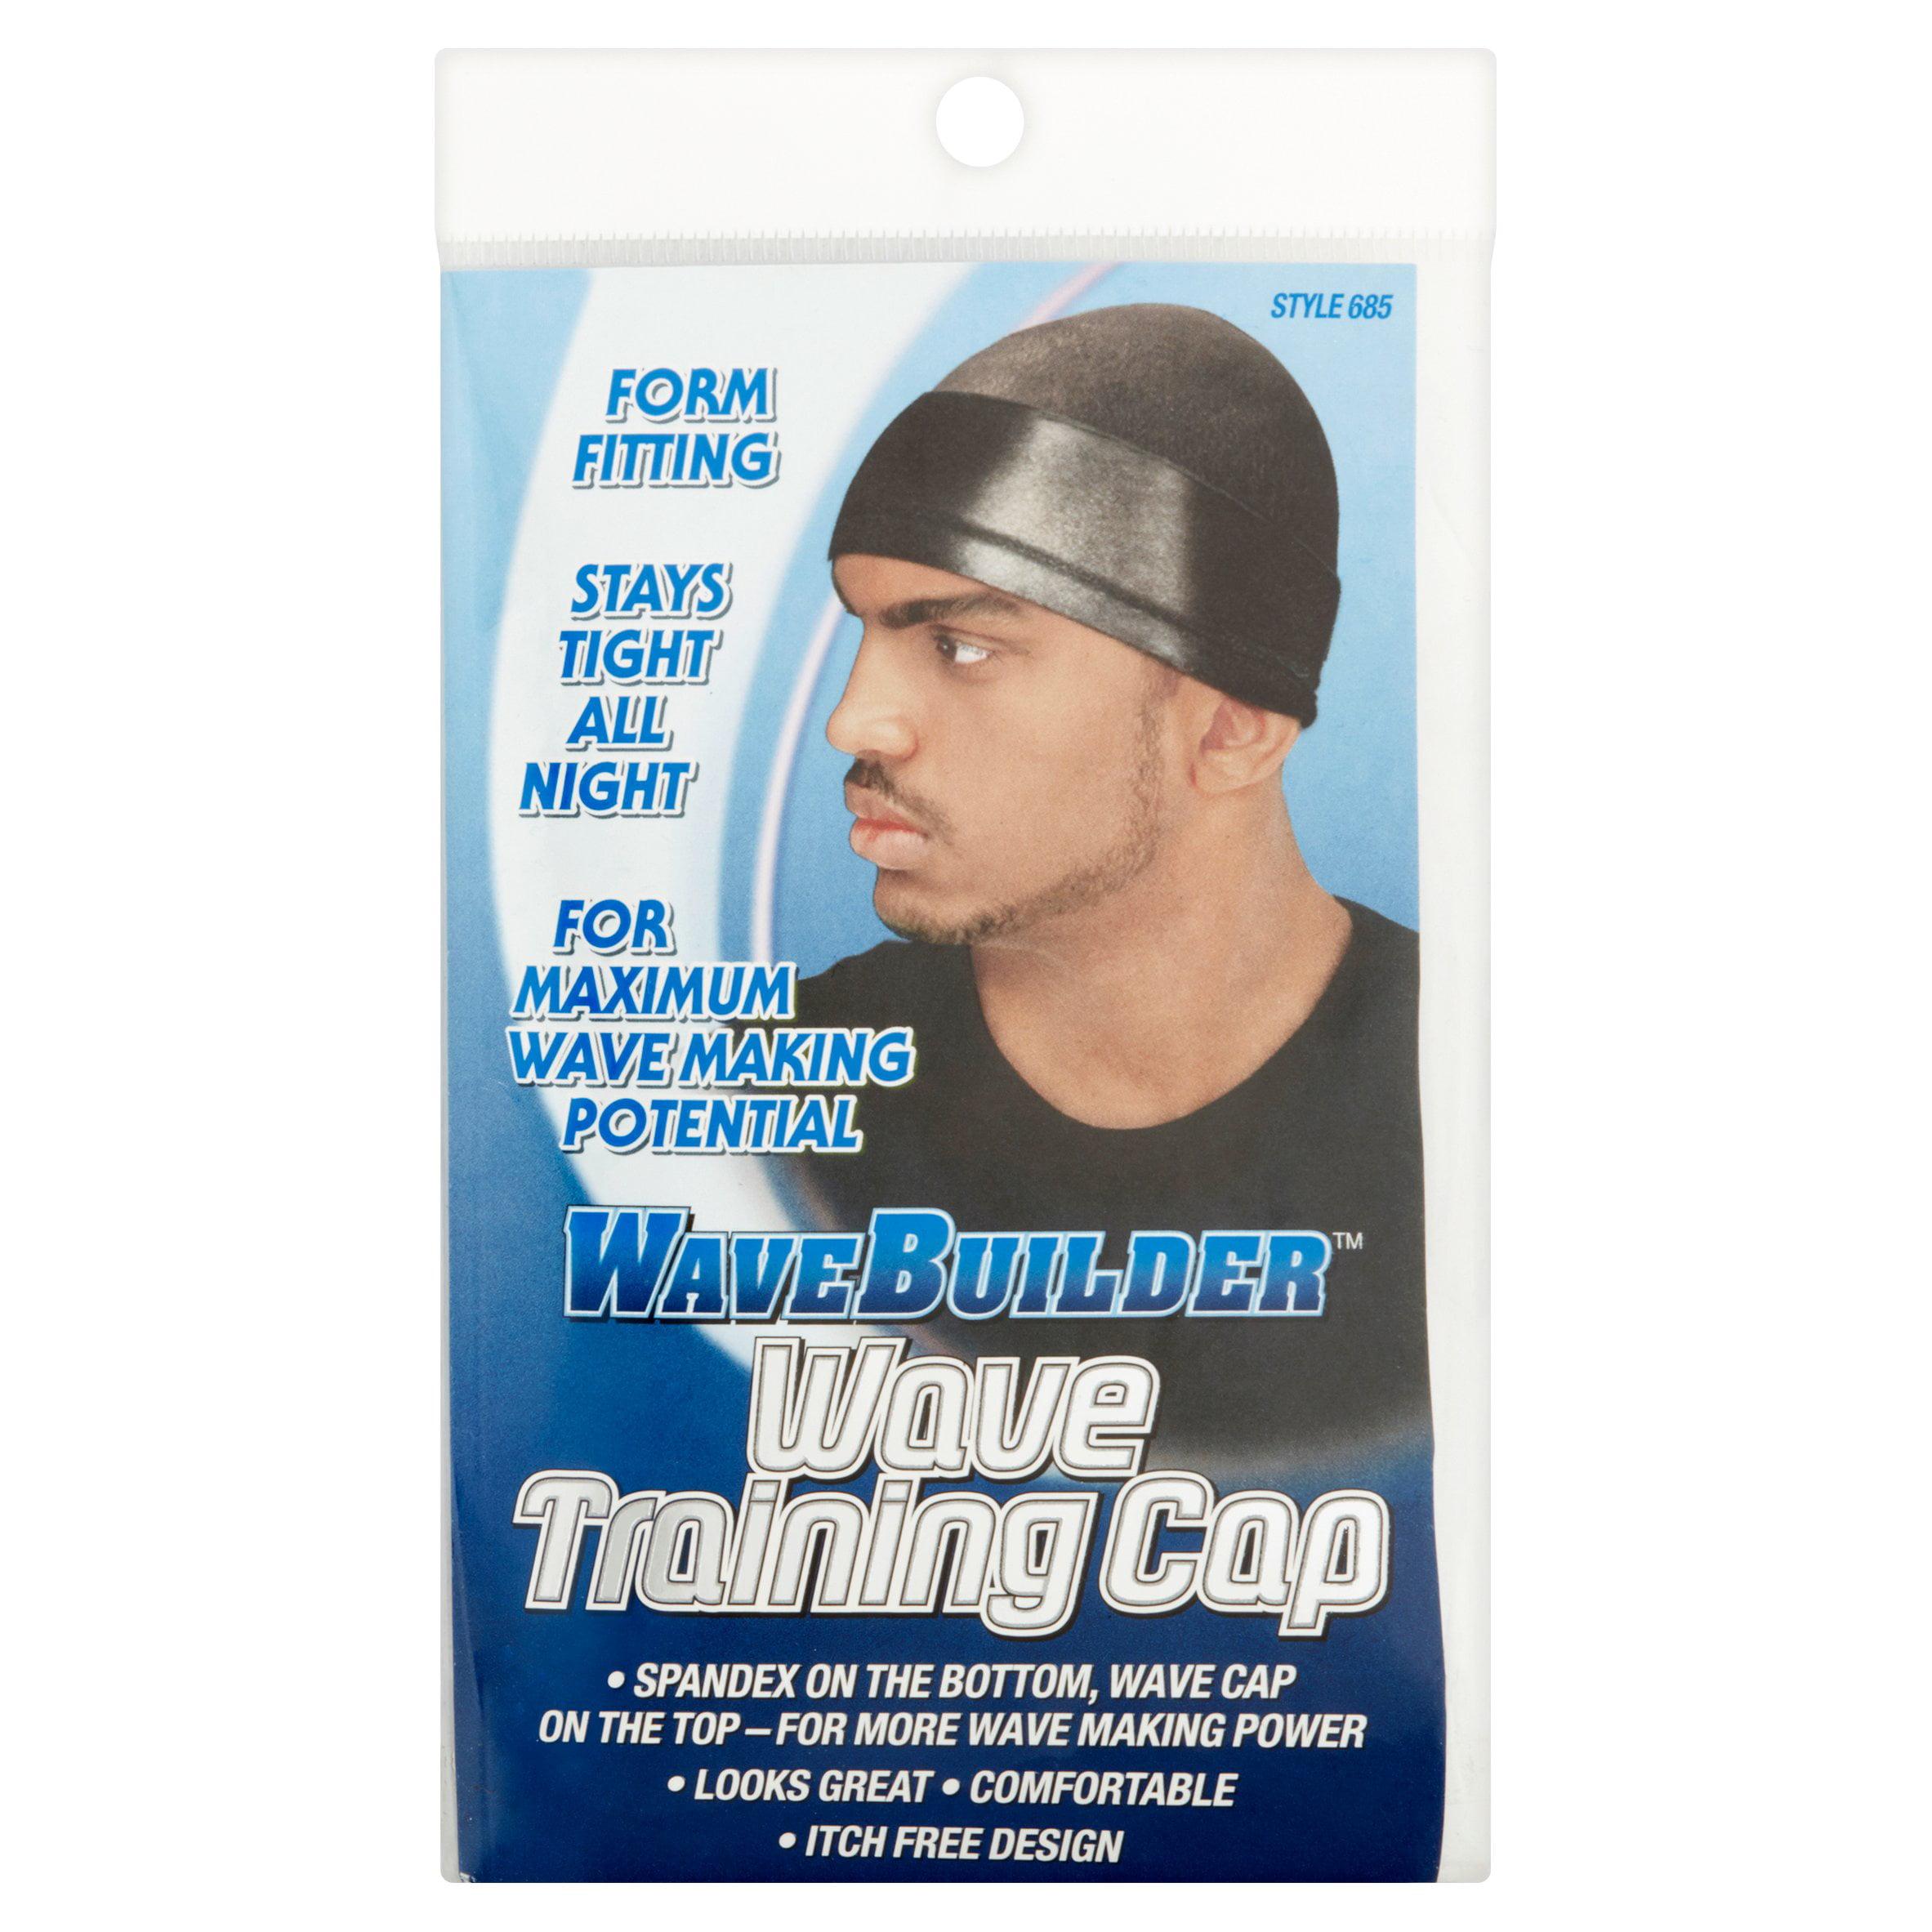 WaveBuilder Wave Training Cap